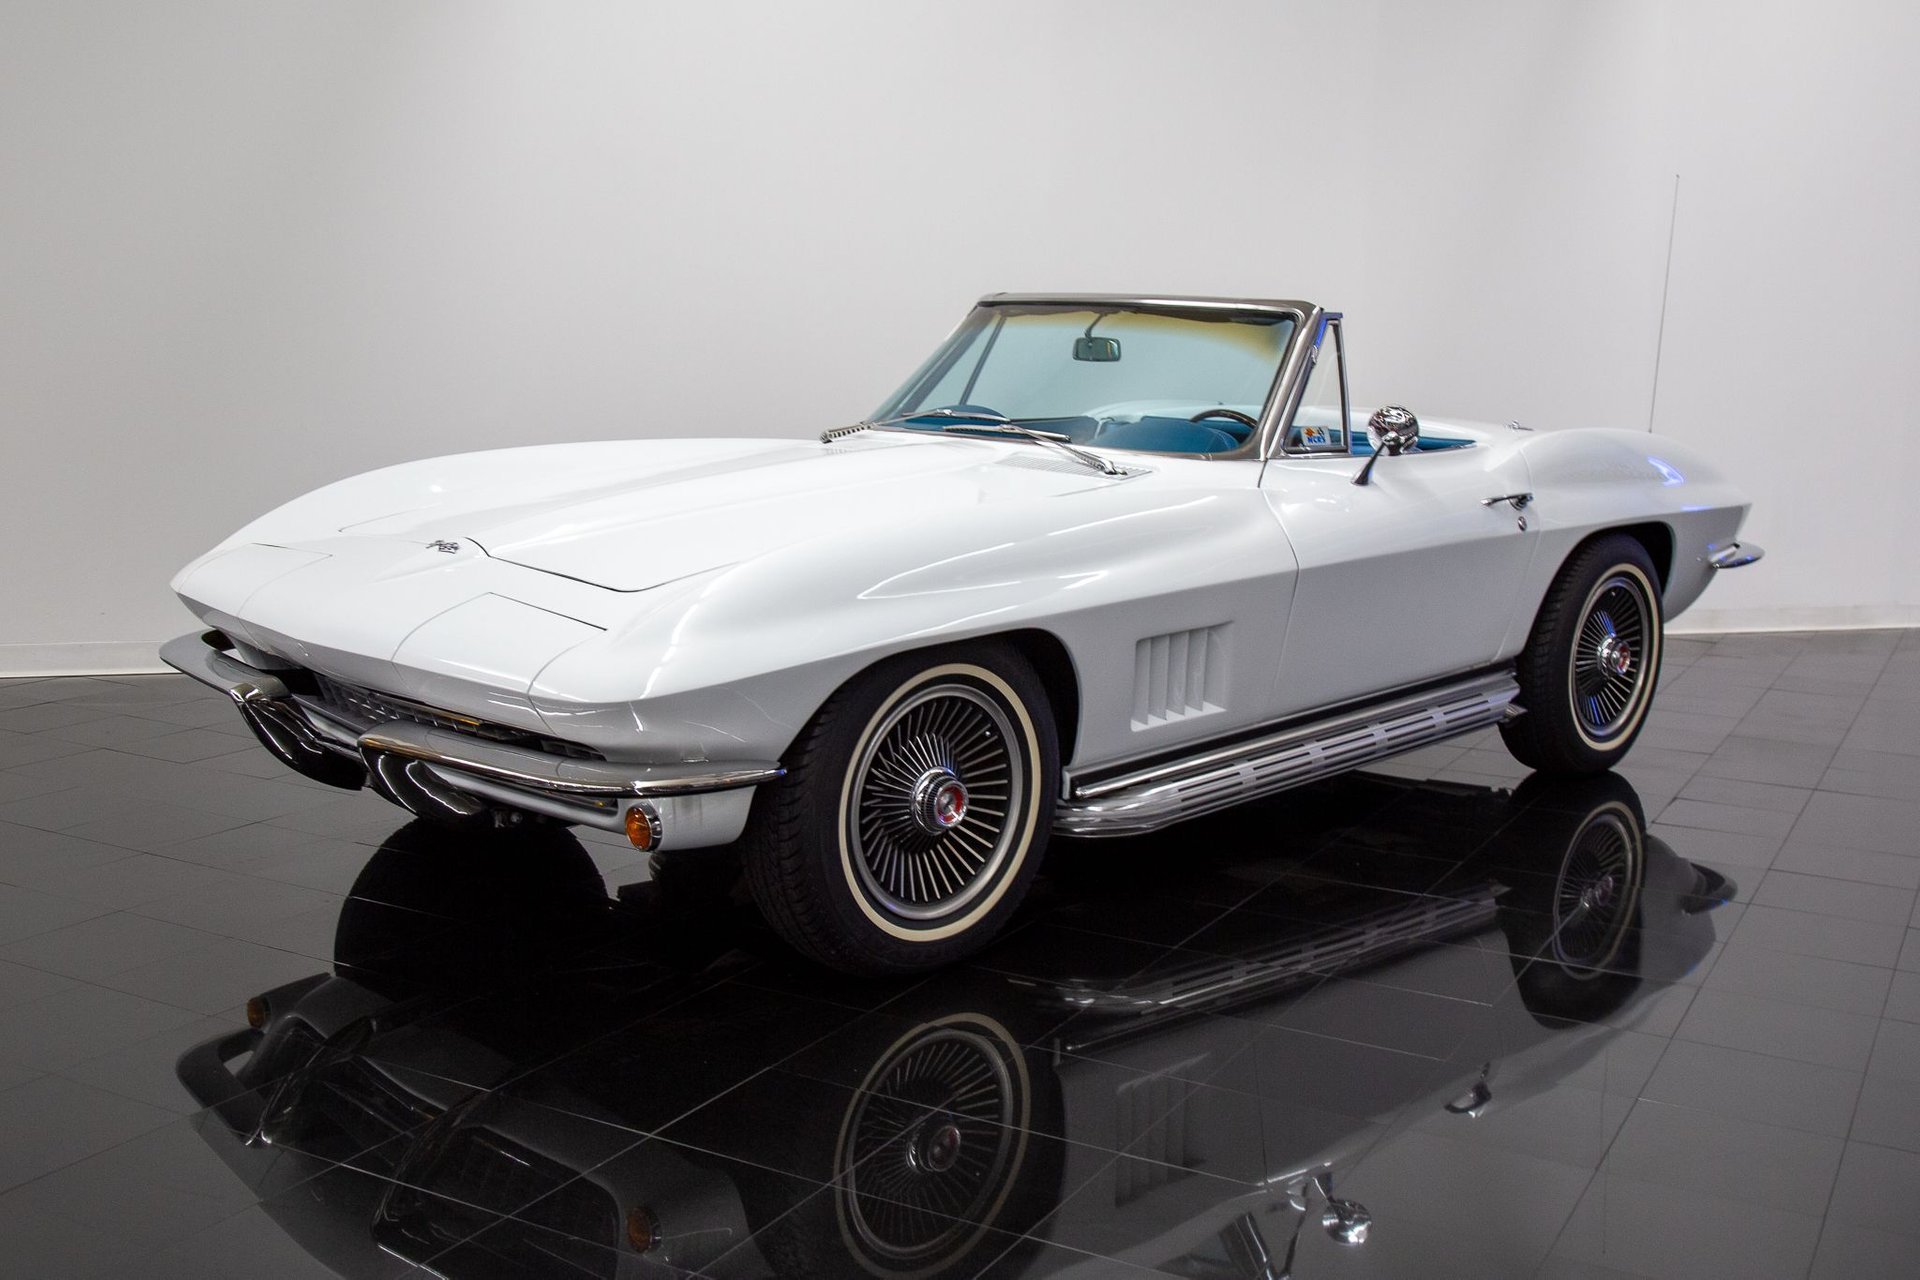 1967 Chevrolet Corvette Convertible for sale